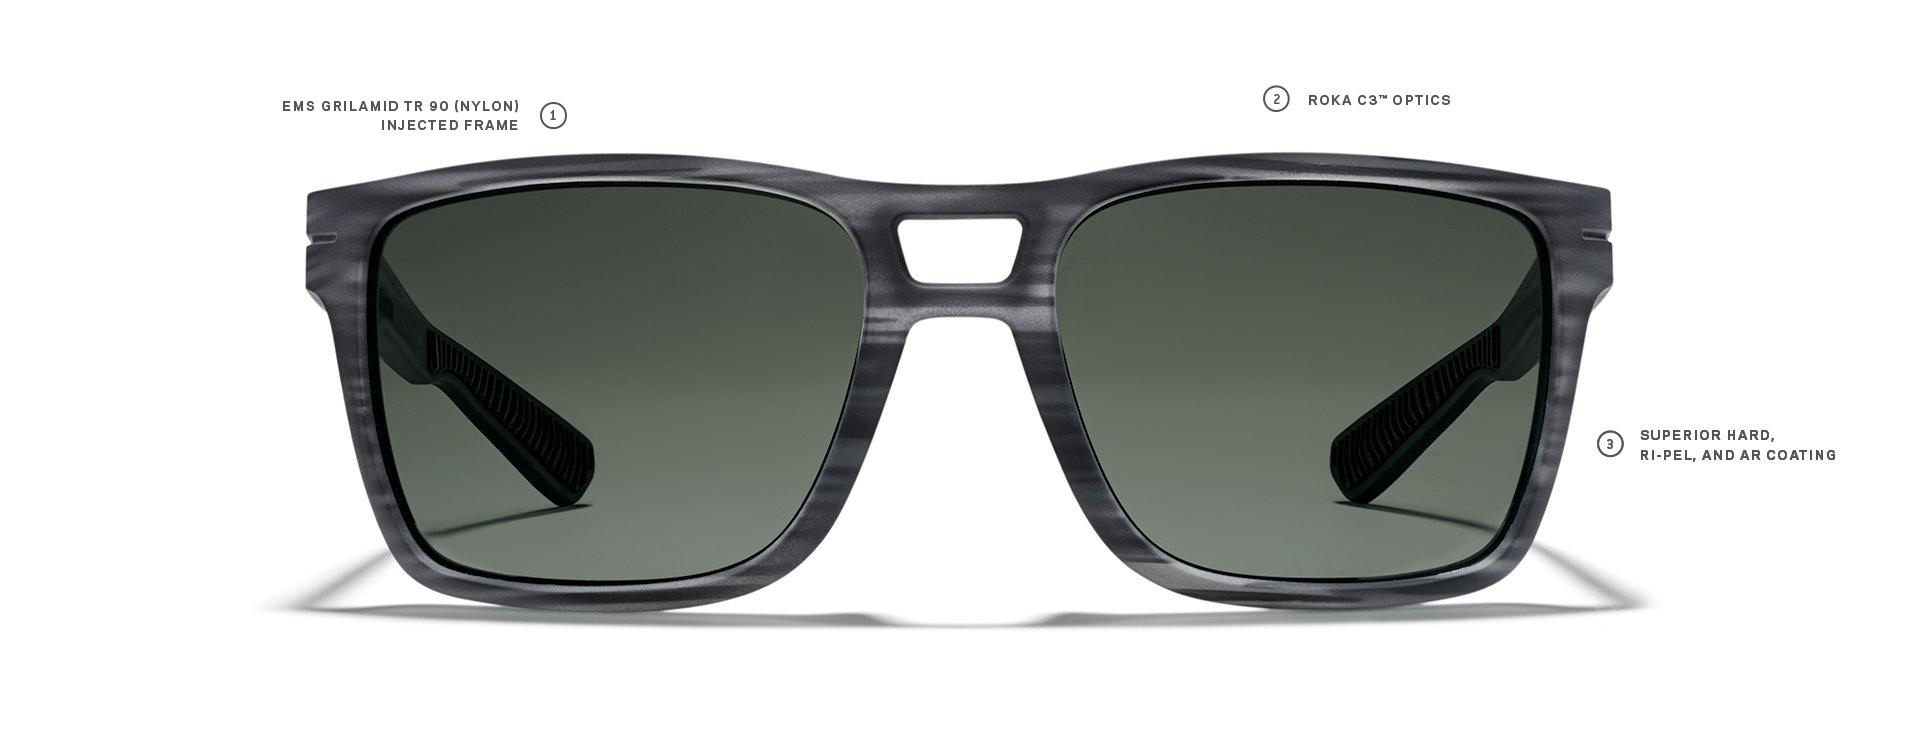 a1b8dcefd09 Square Sunglasses - Premium Nylon Lens - Running Sunglasses